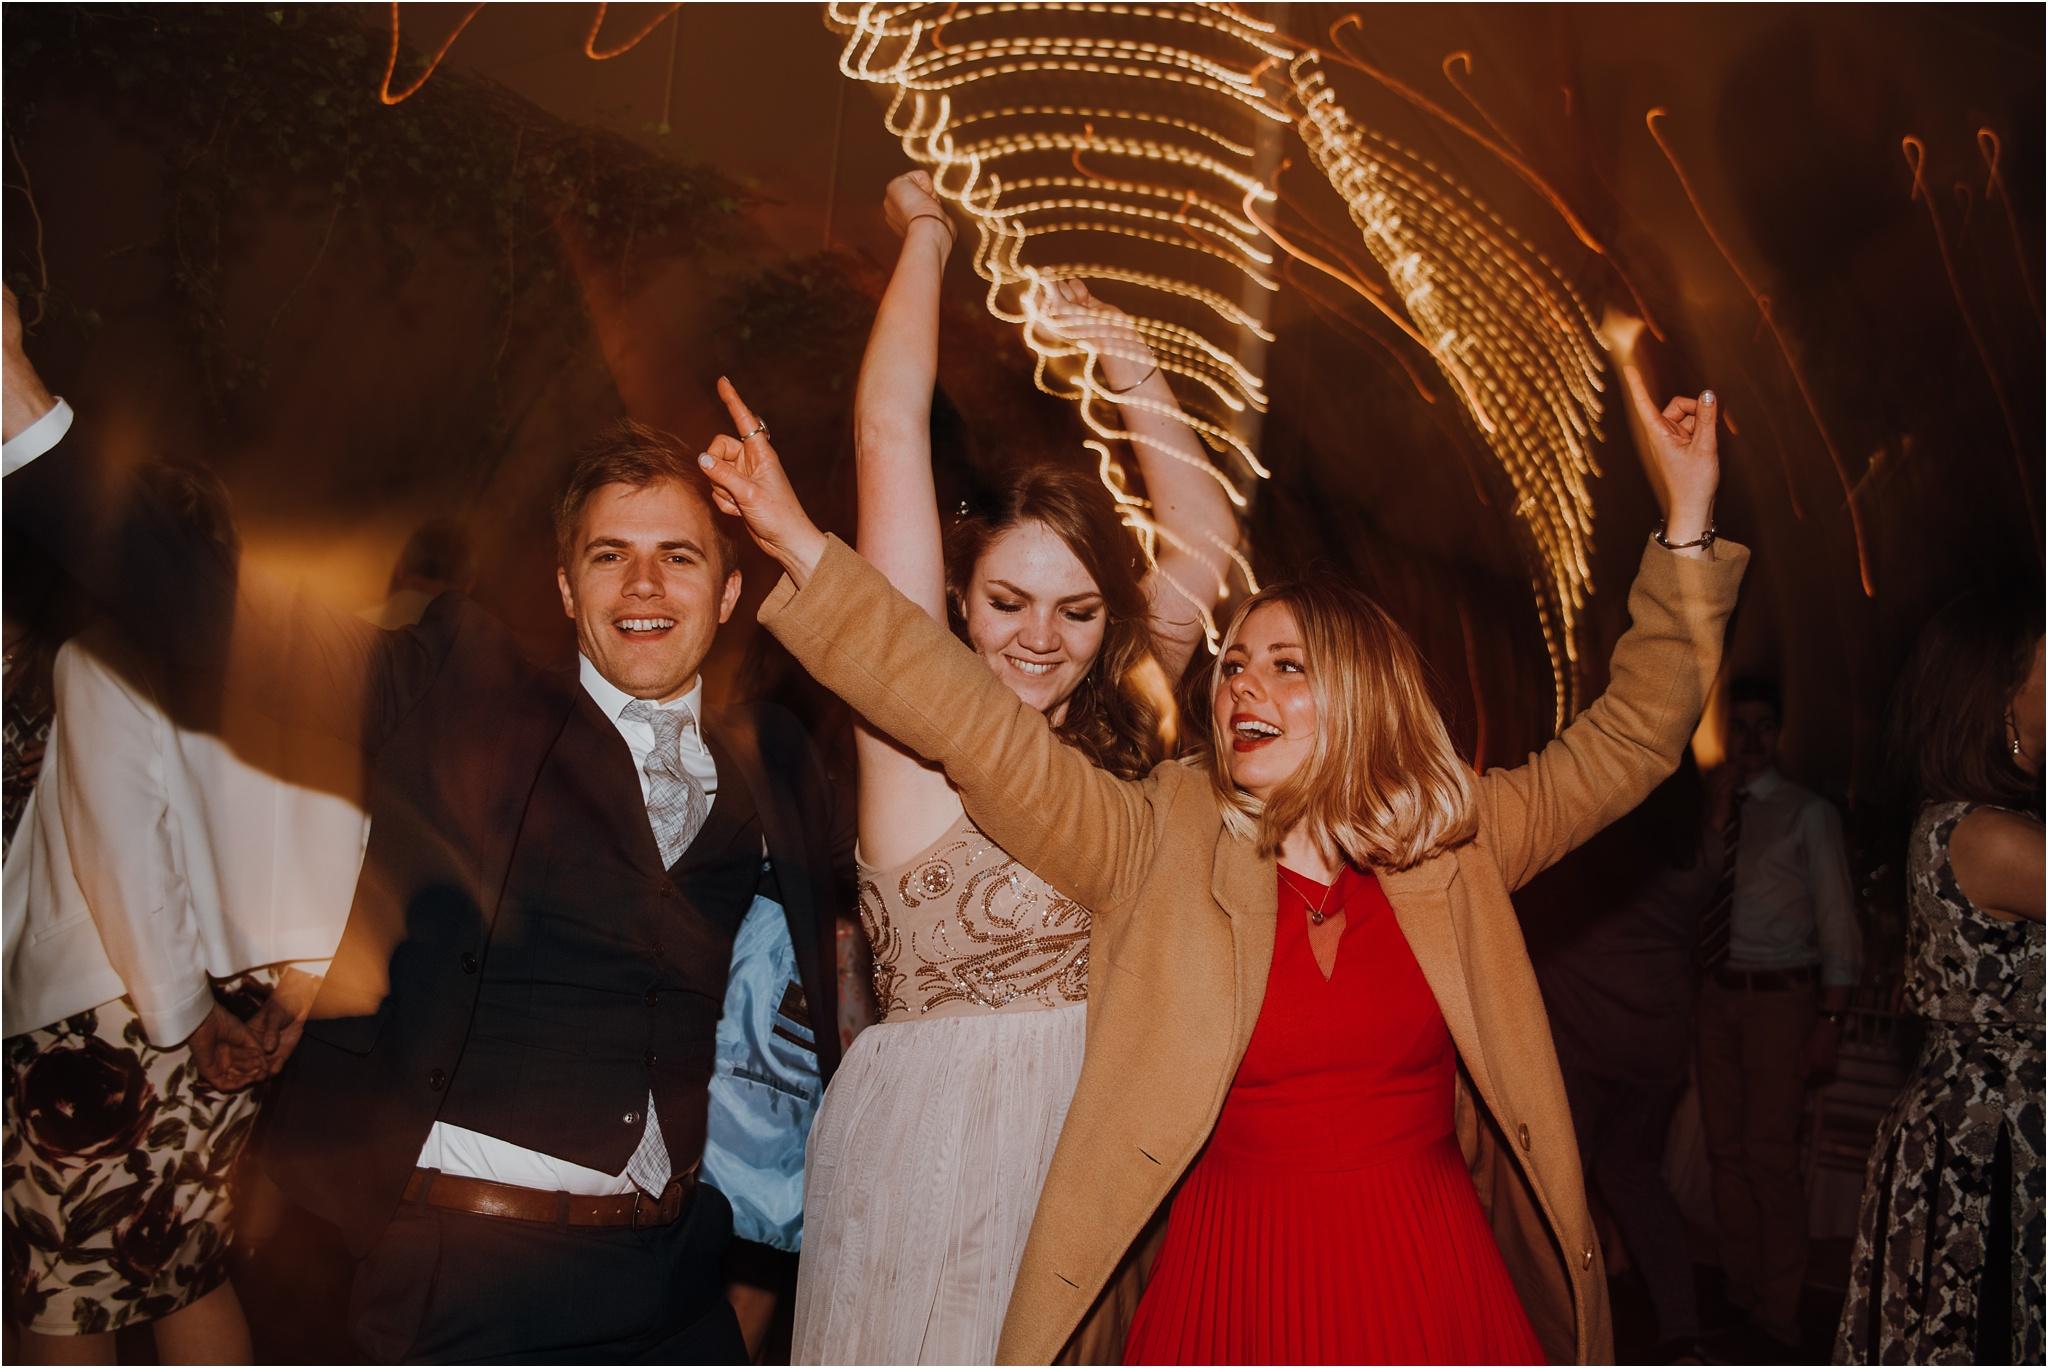 Outdoor-country-wedding-Edinburgh-photographer__0149.jpg